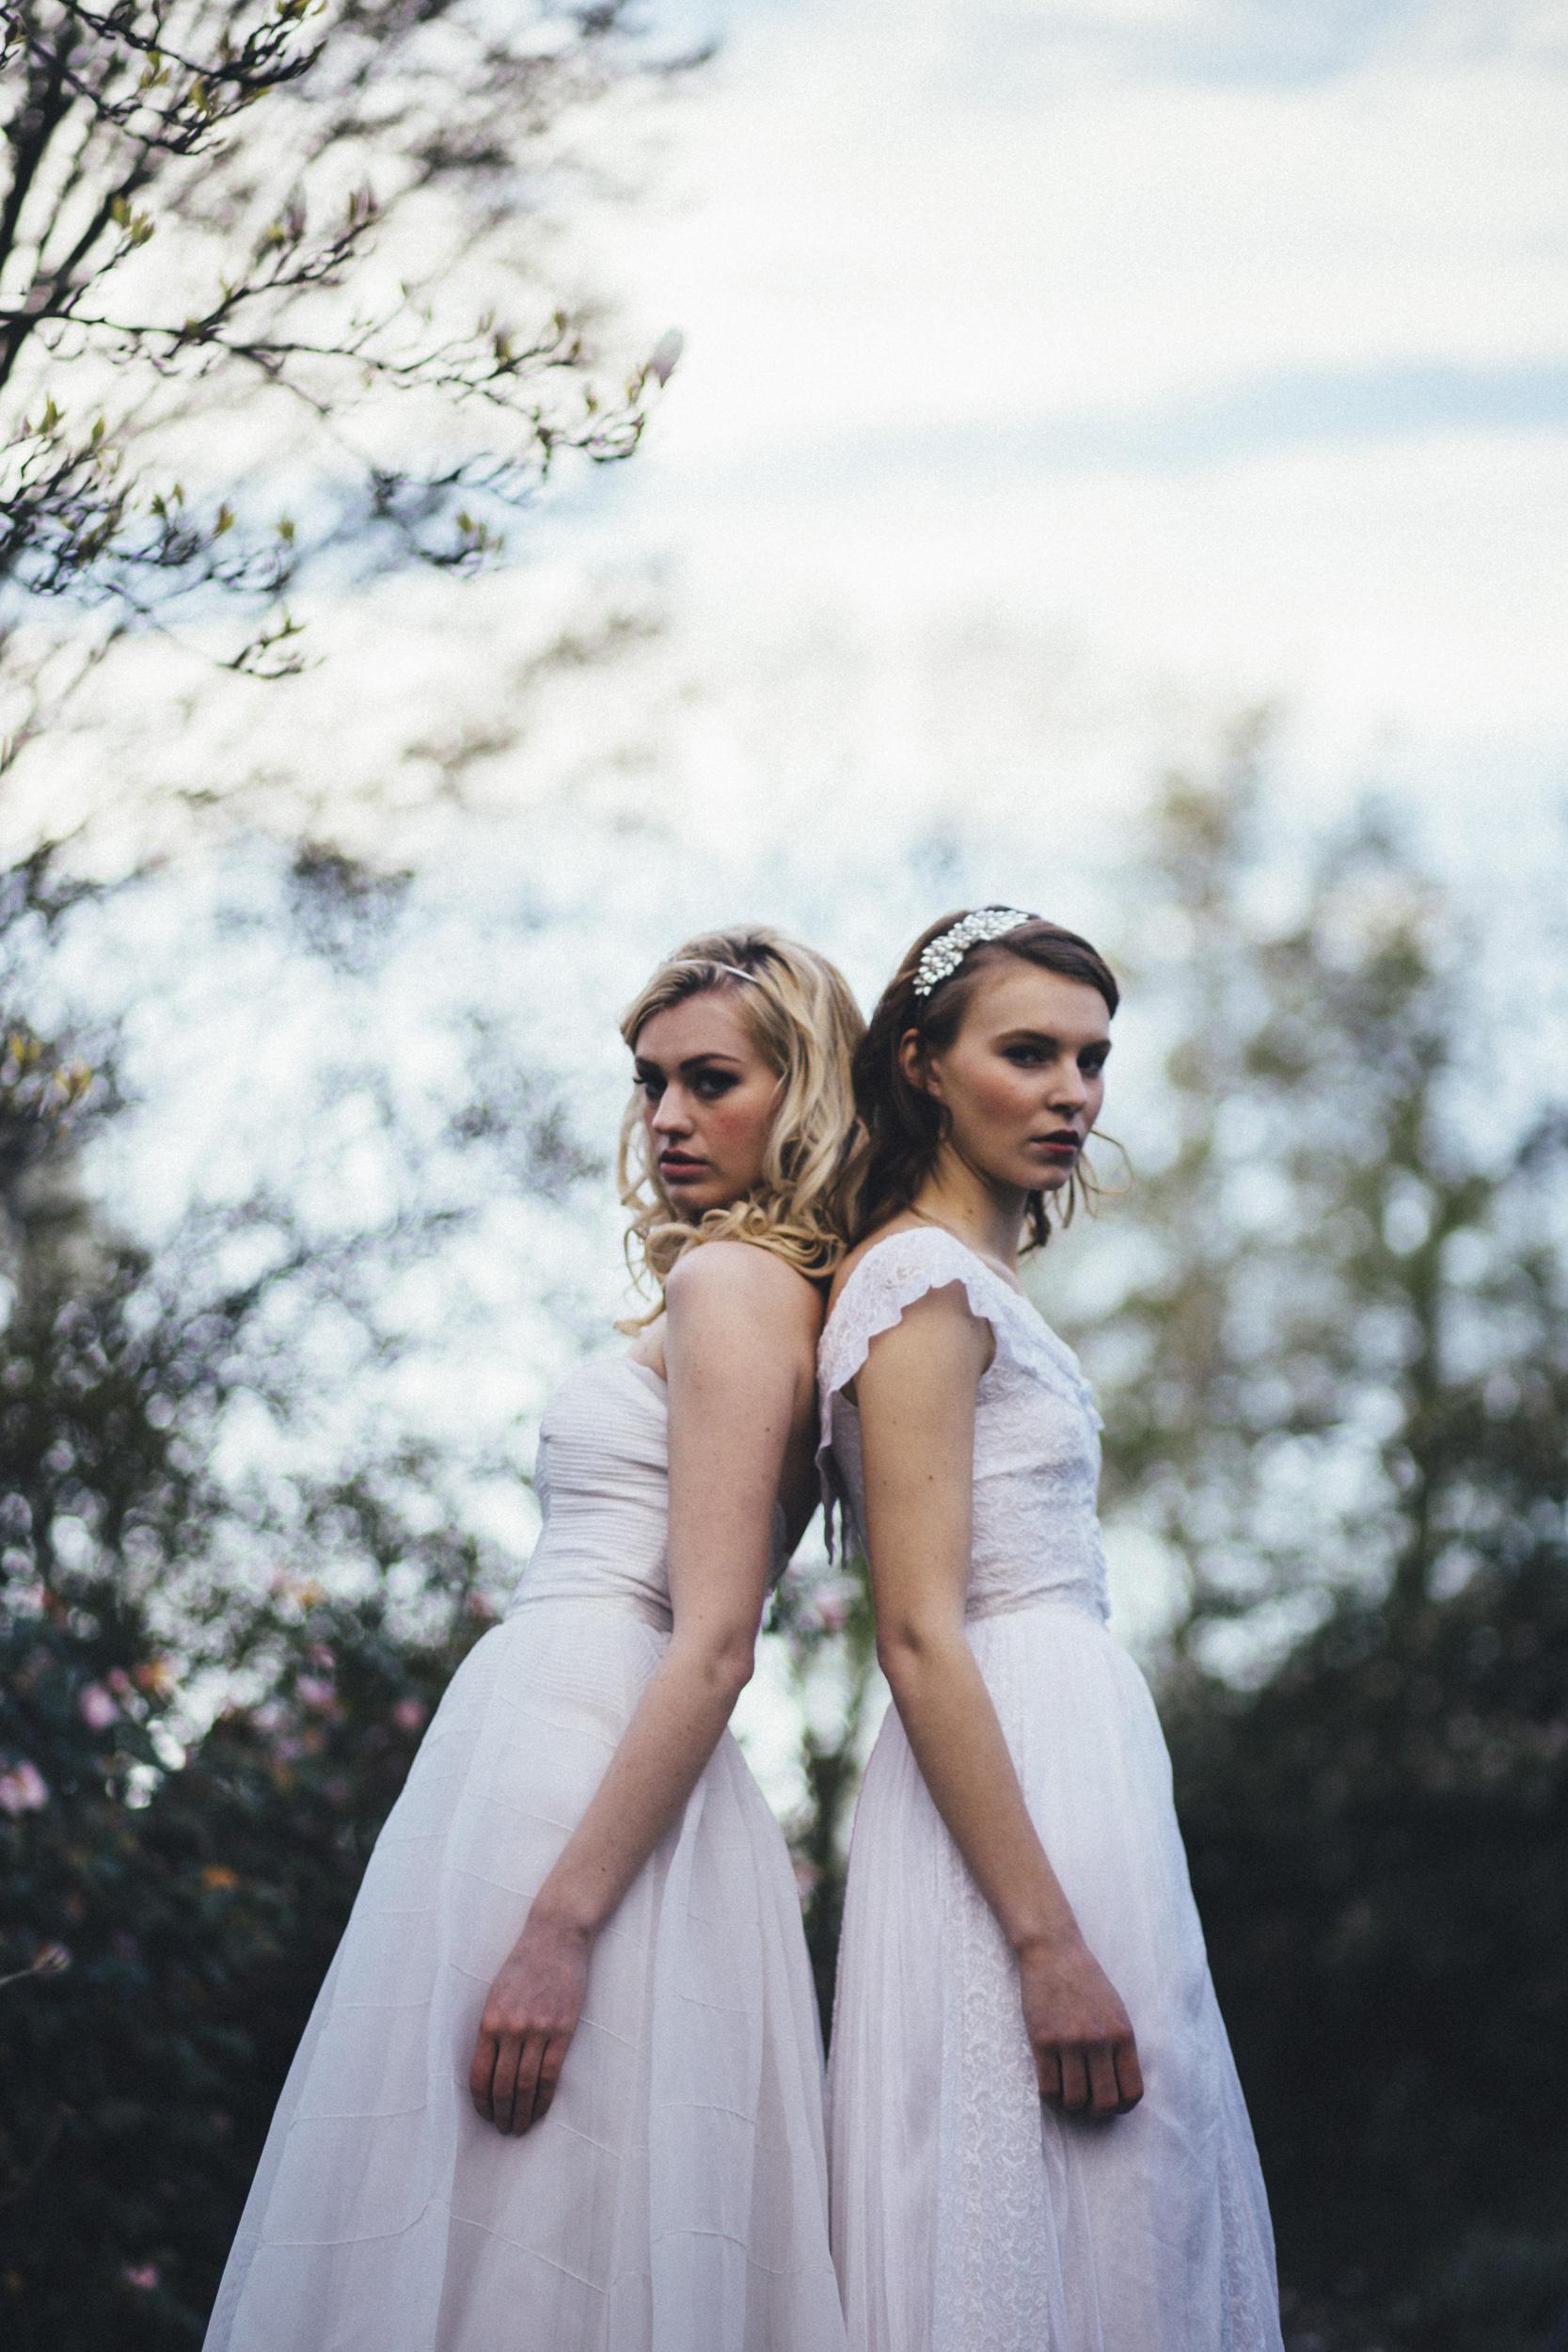 Spring-Bridal-Kate-Beaumont-Shelley-Richmond-Vintage-Wedding-Dress-20.jpg